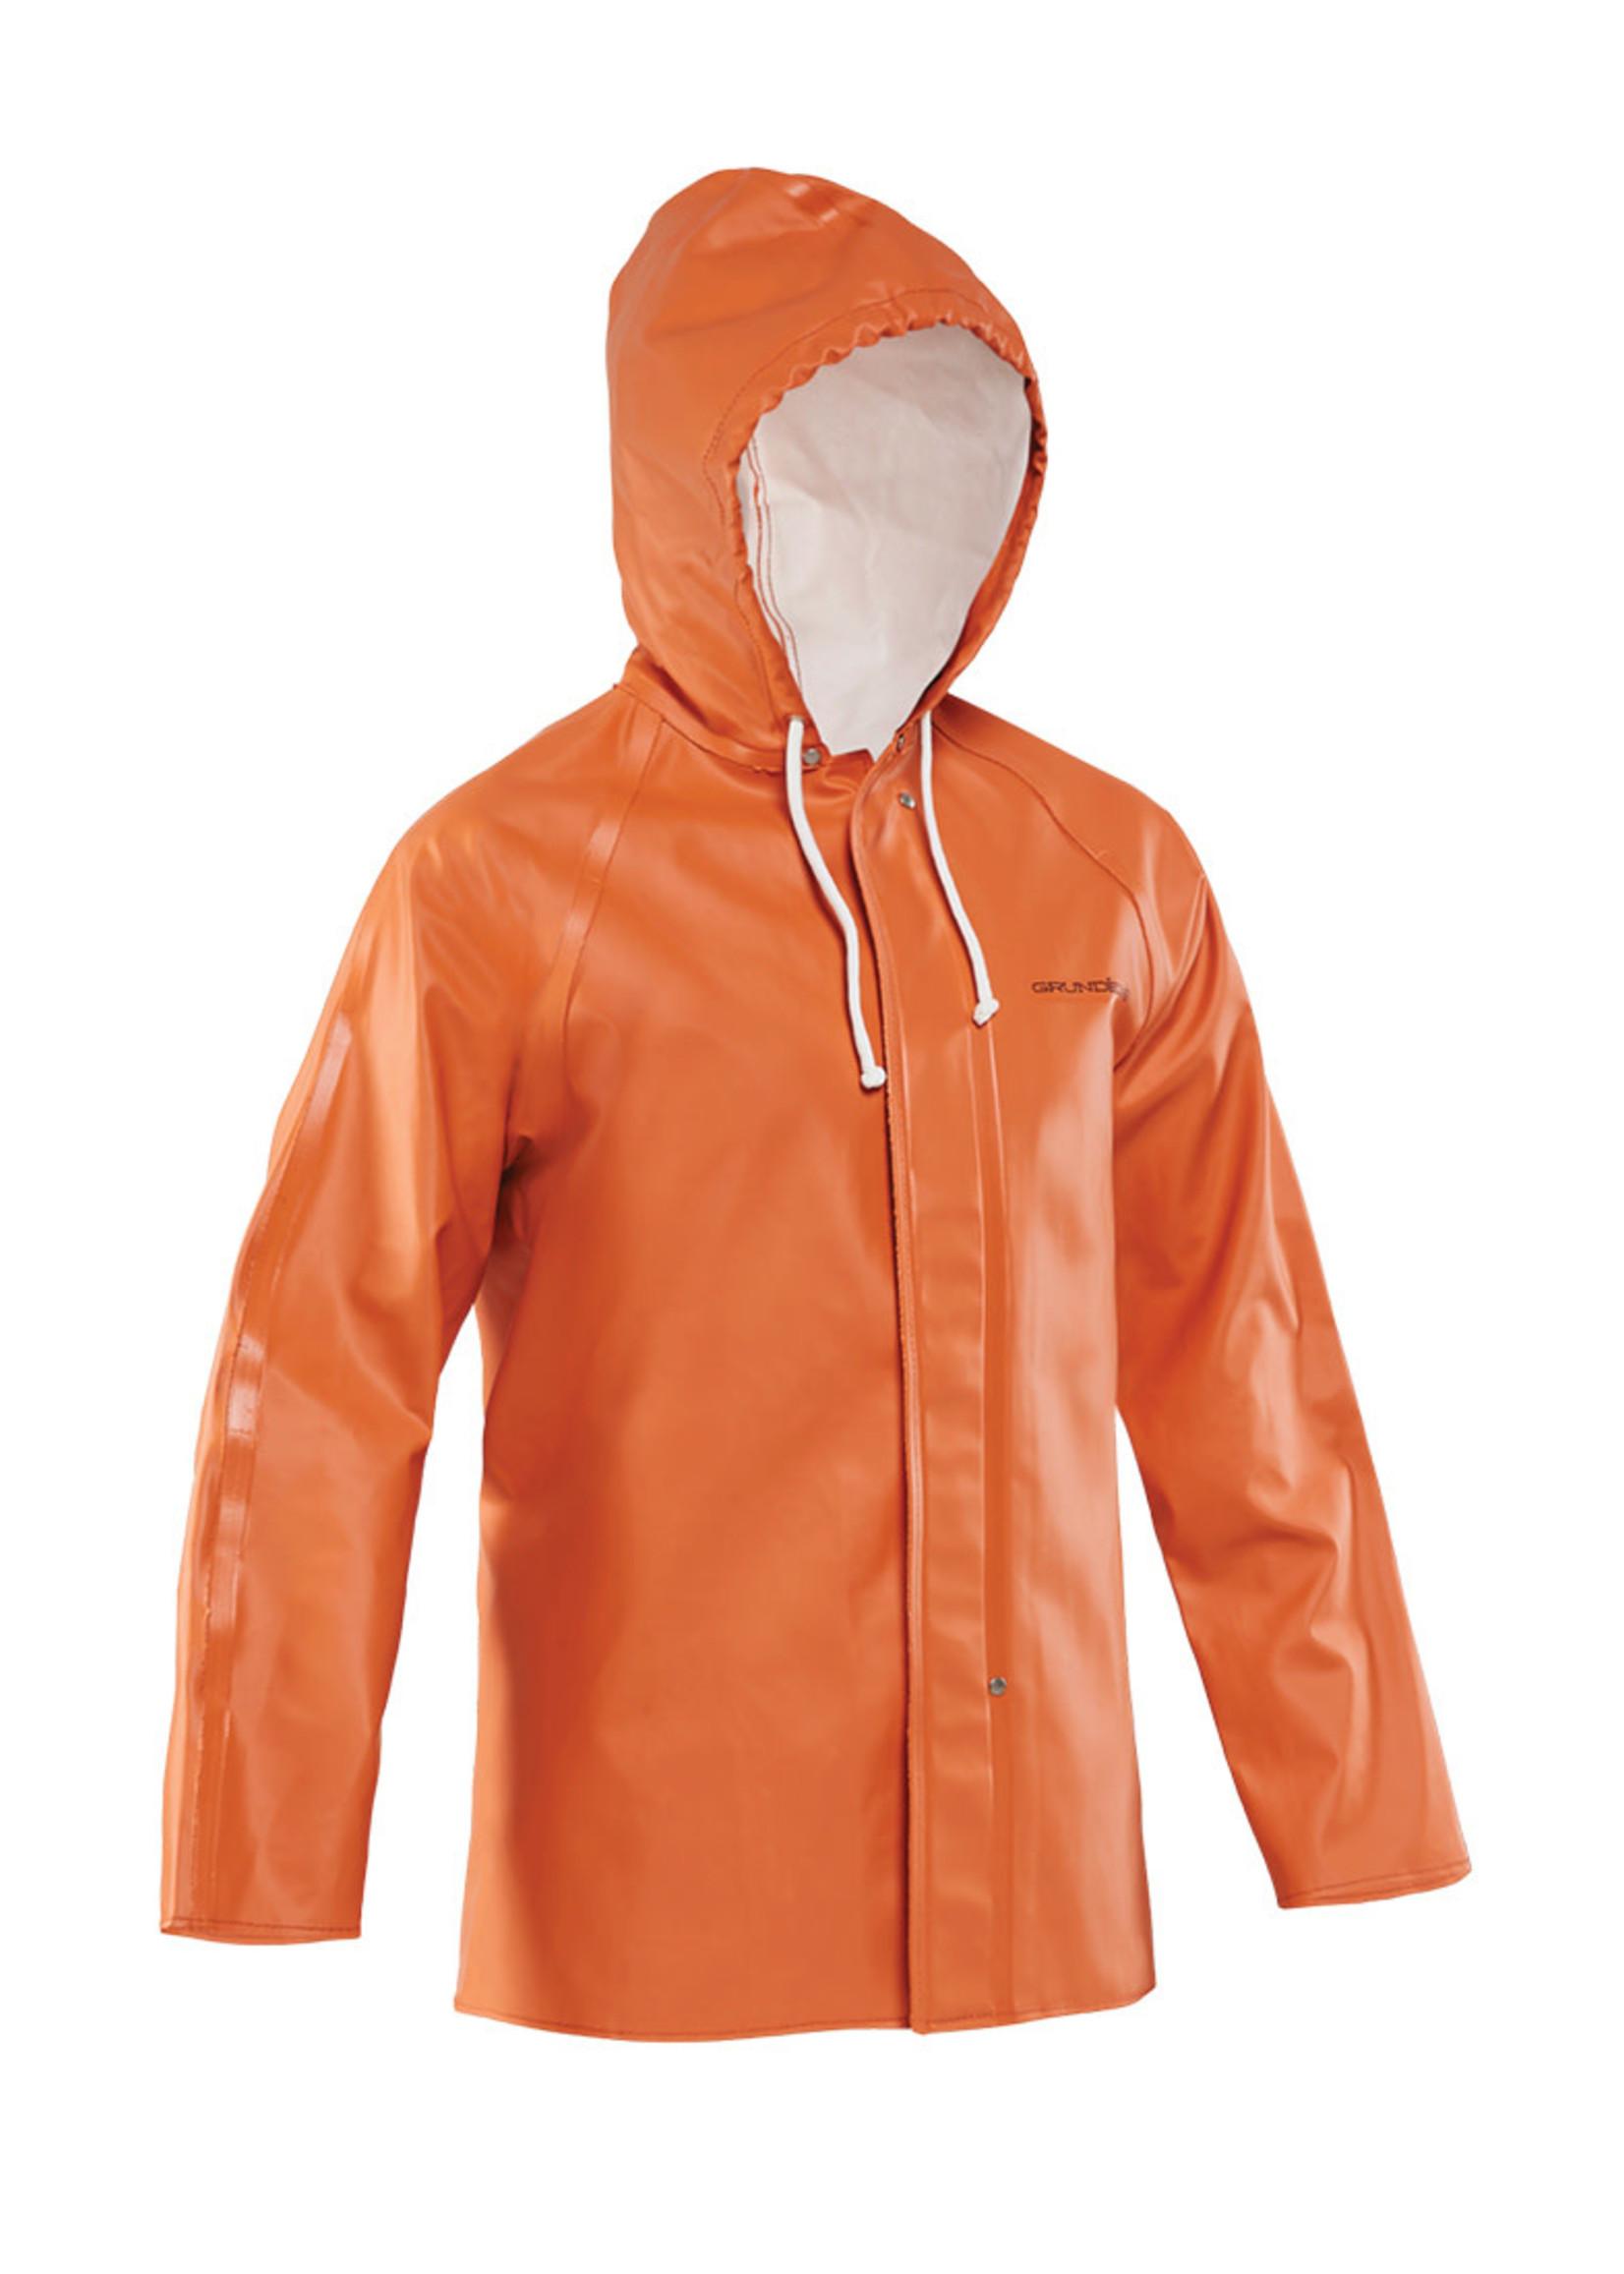 GRUNDENS USA, LTD. Grundens Clipper Youth Hooded Jacket